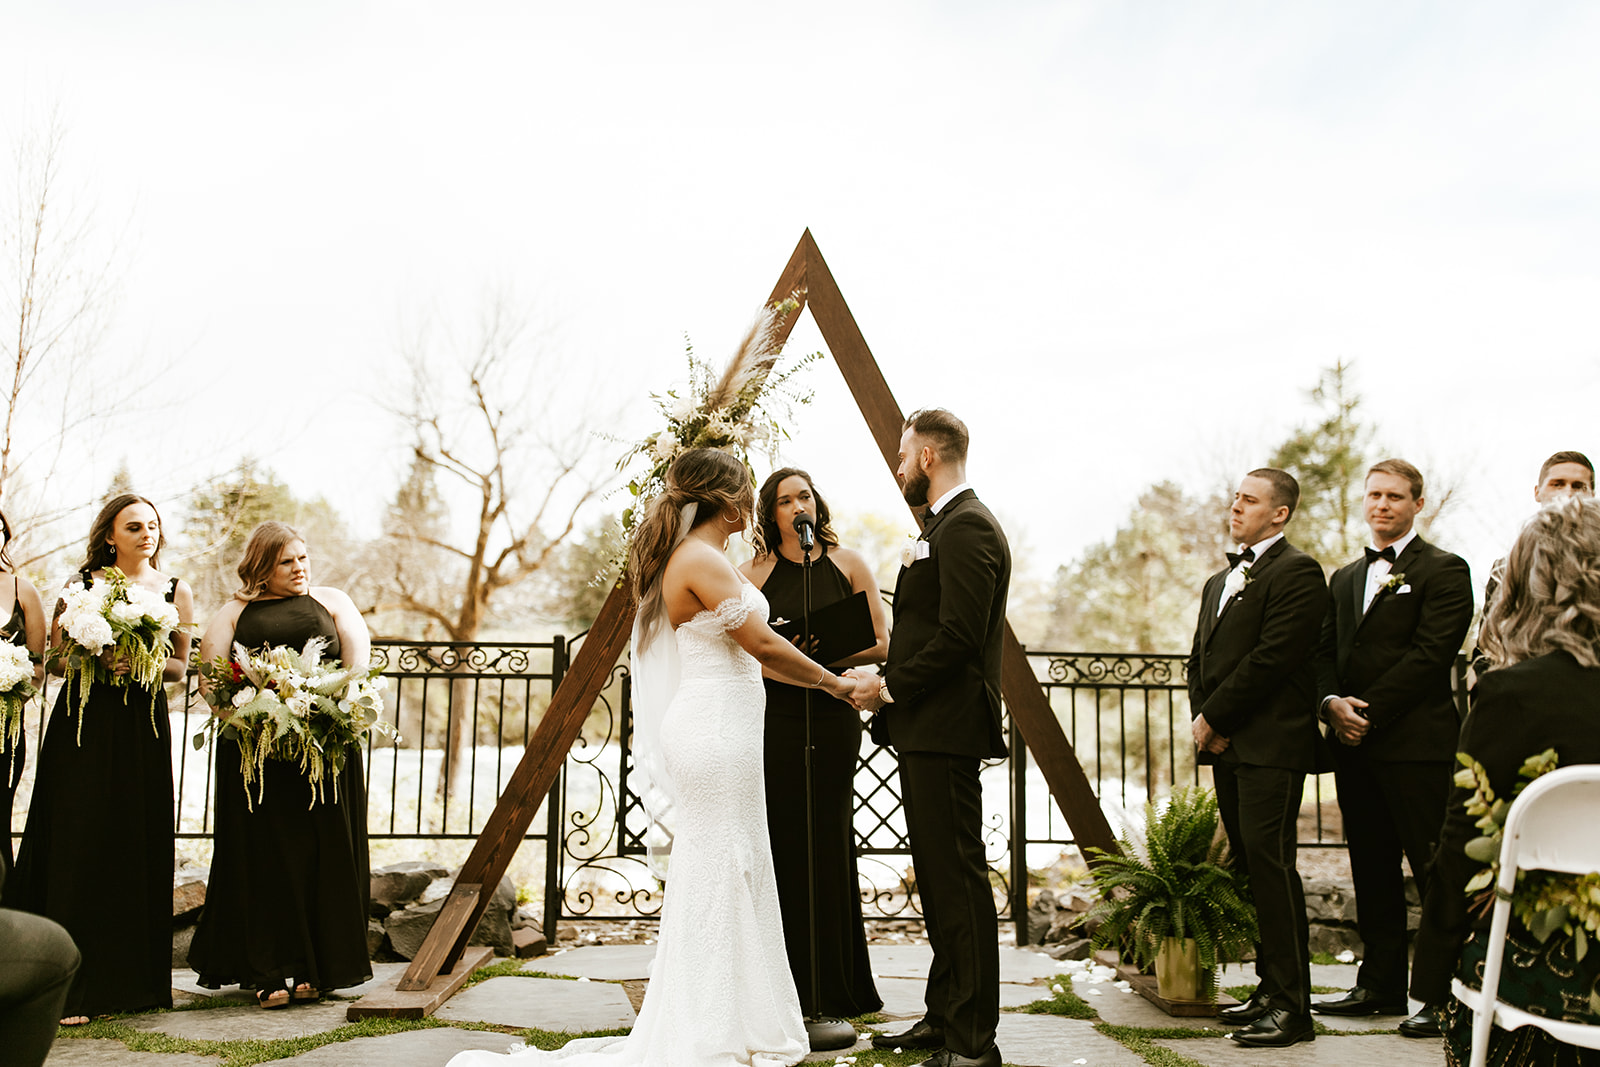 Chateau Rive Spokane Wedding Spokane Blog Dress ceremony